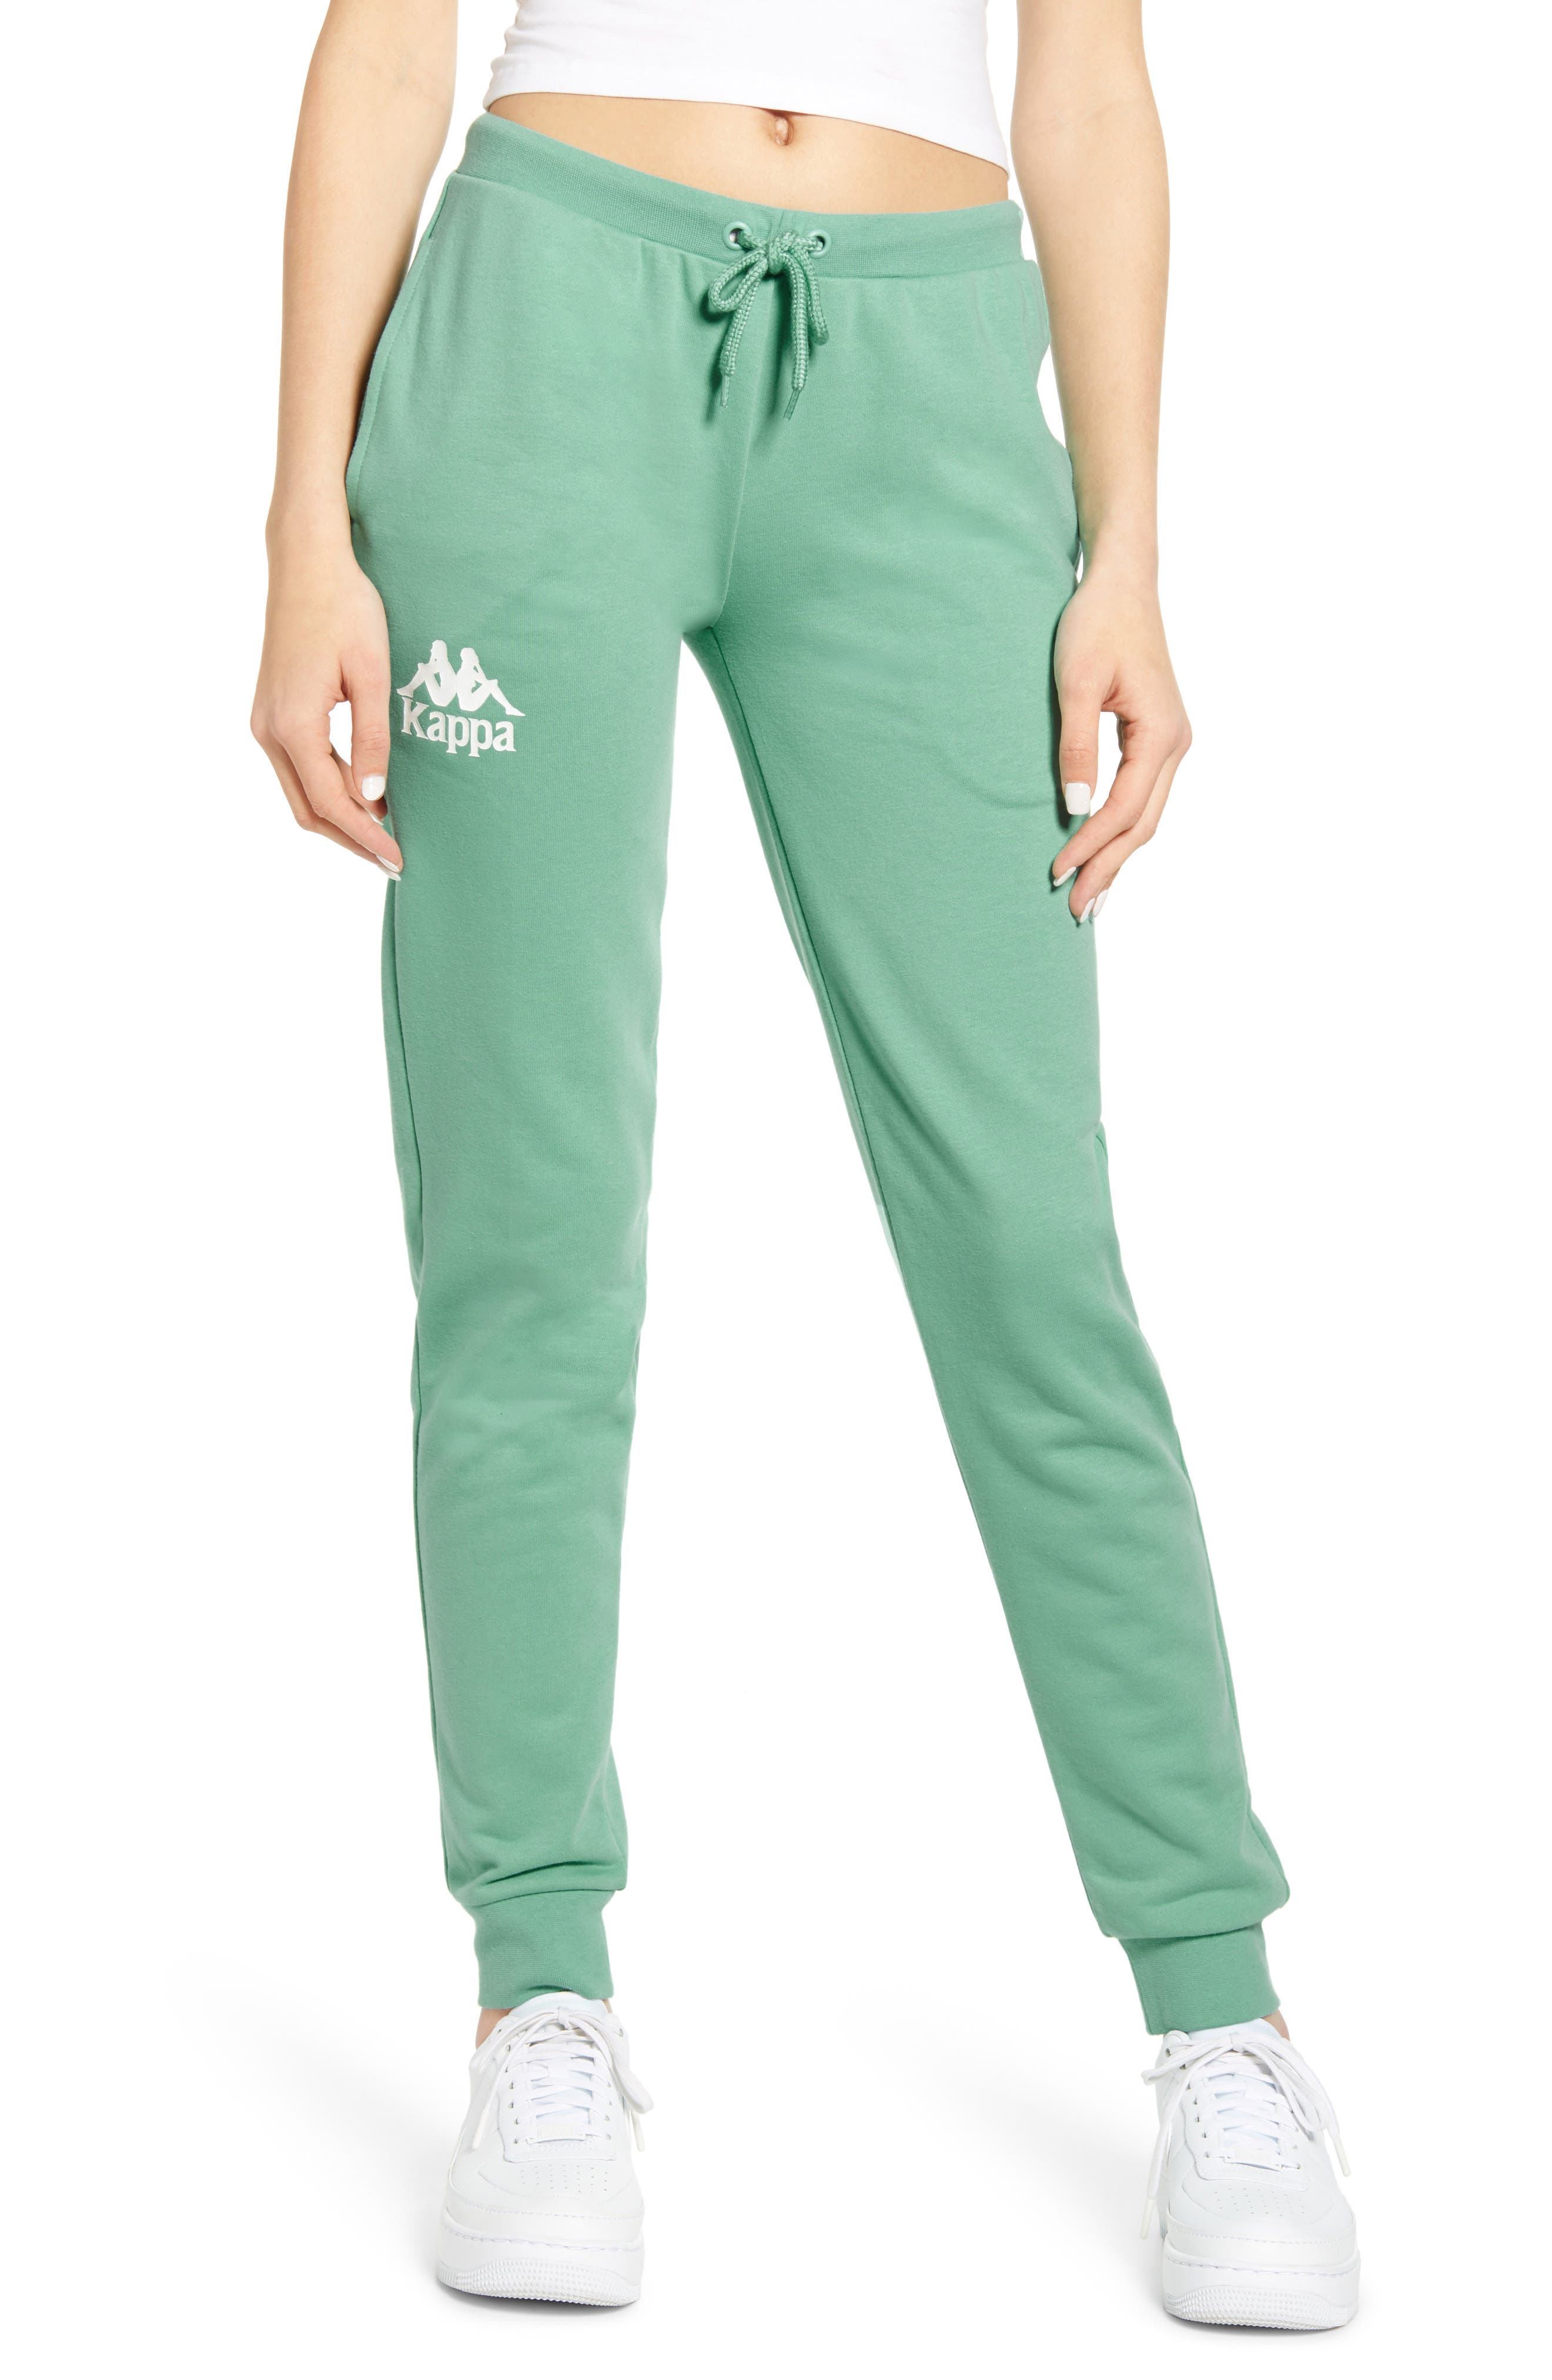 Women's Kappa Cailo Banded Sweatpants